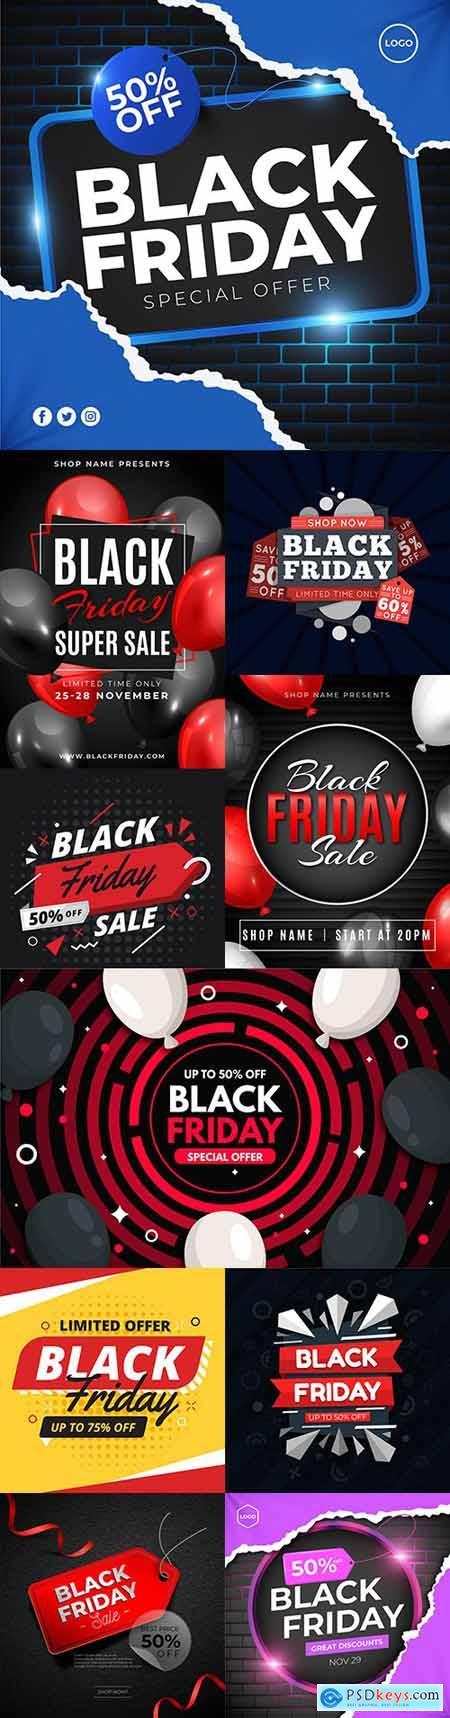 Black Friday and sale special design illustration 35